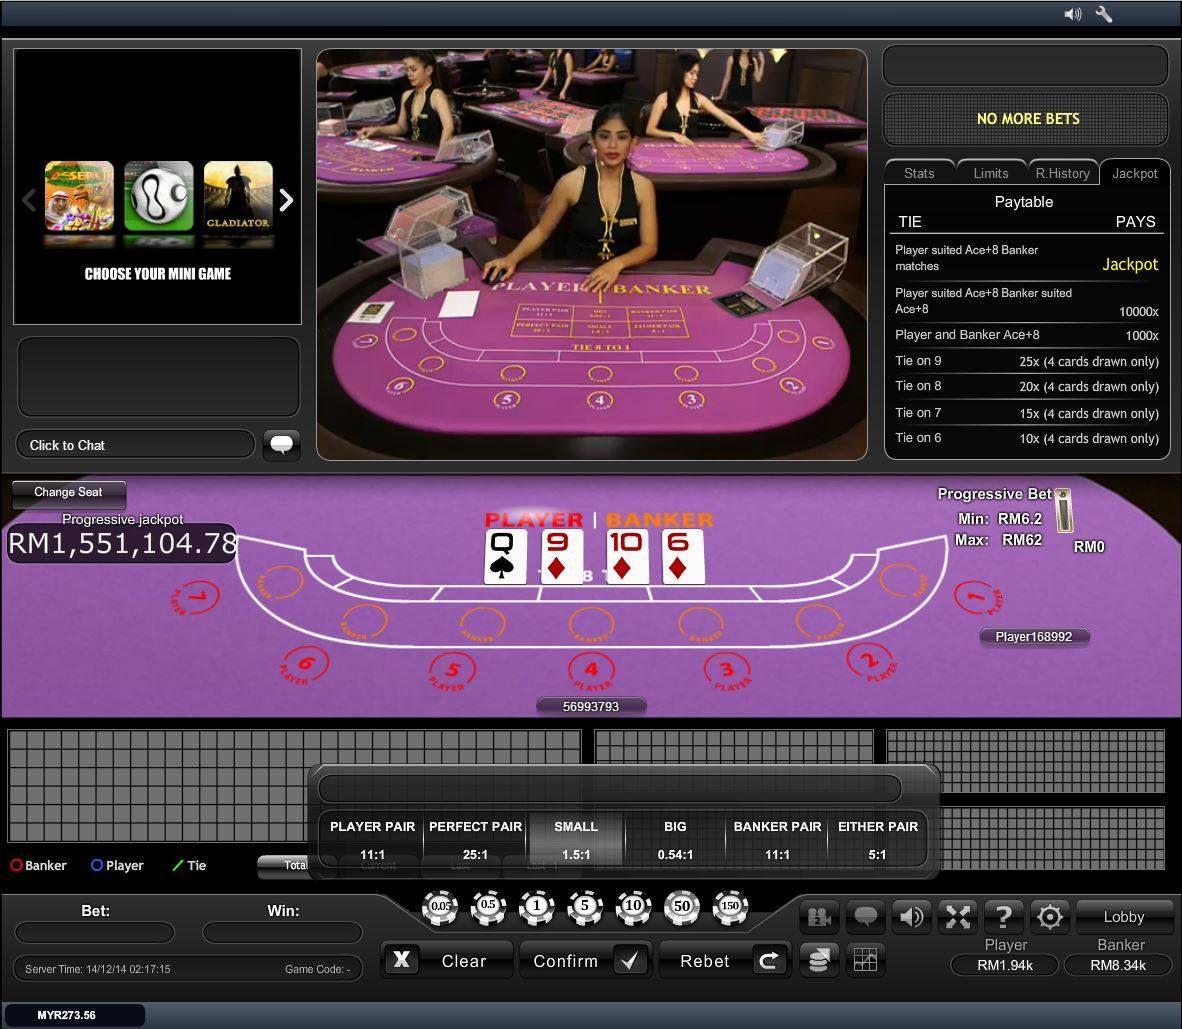 Infiniwin Live Casino Playtech Club Progressive Baccarat